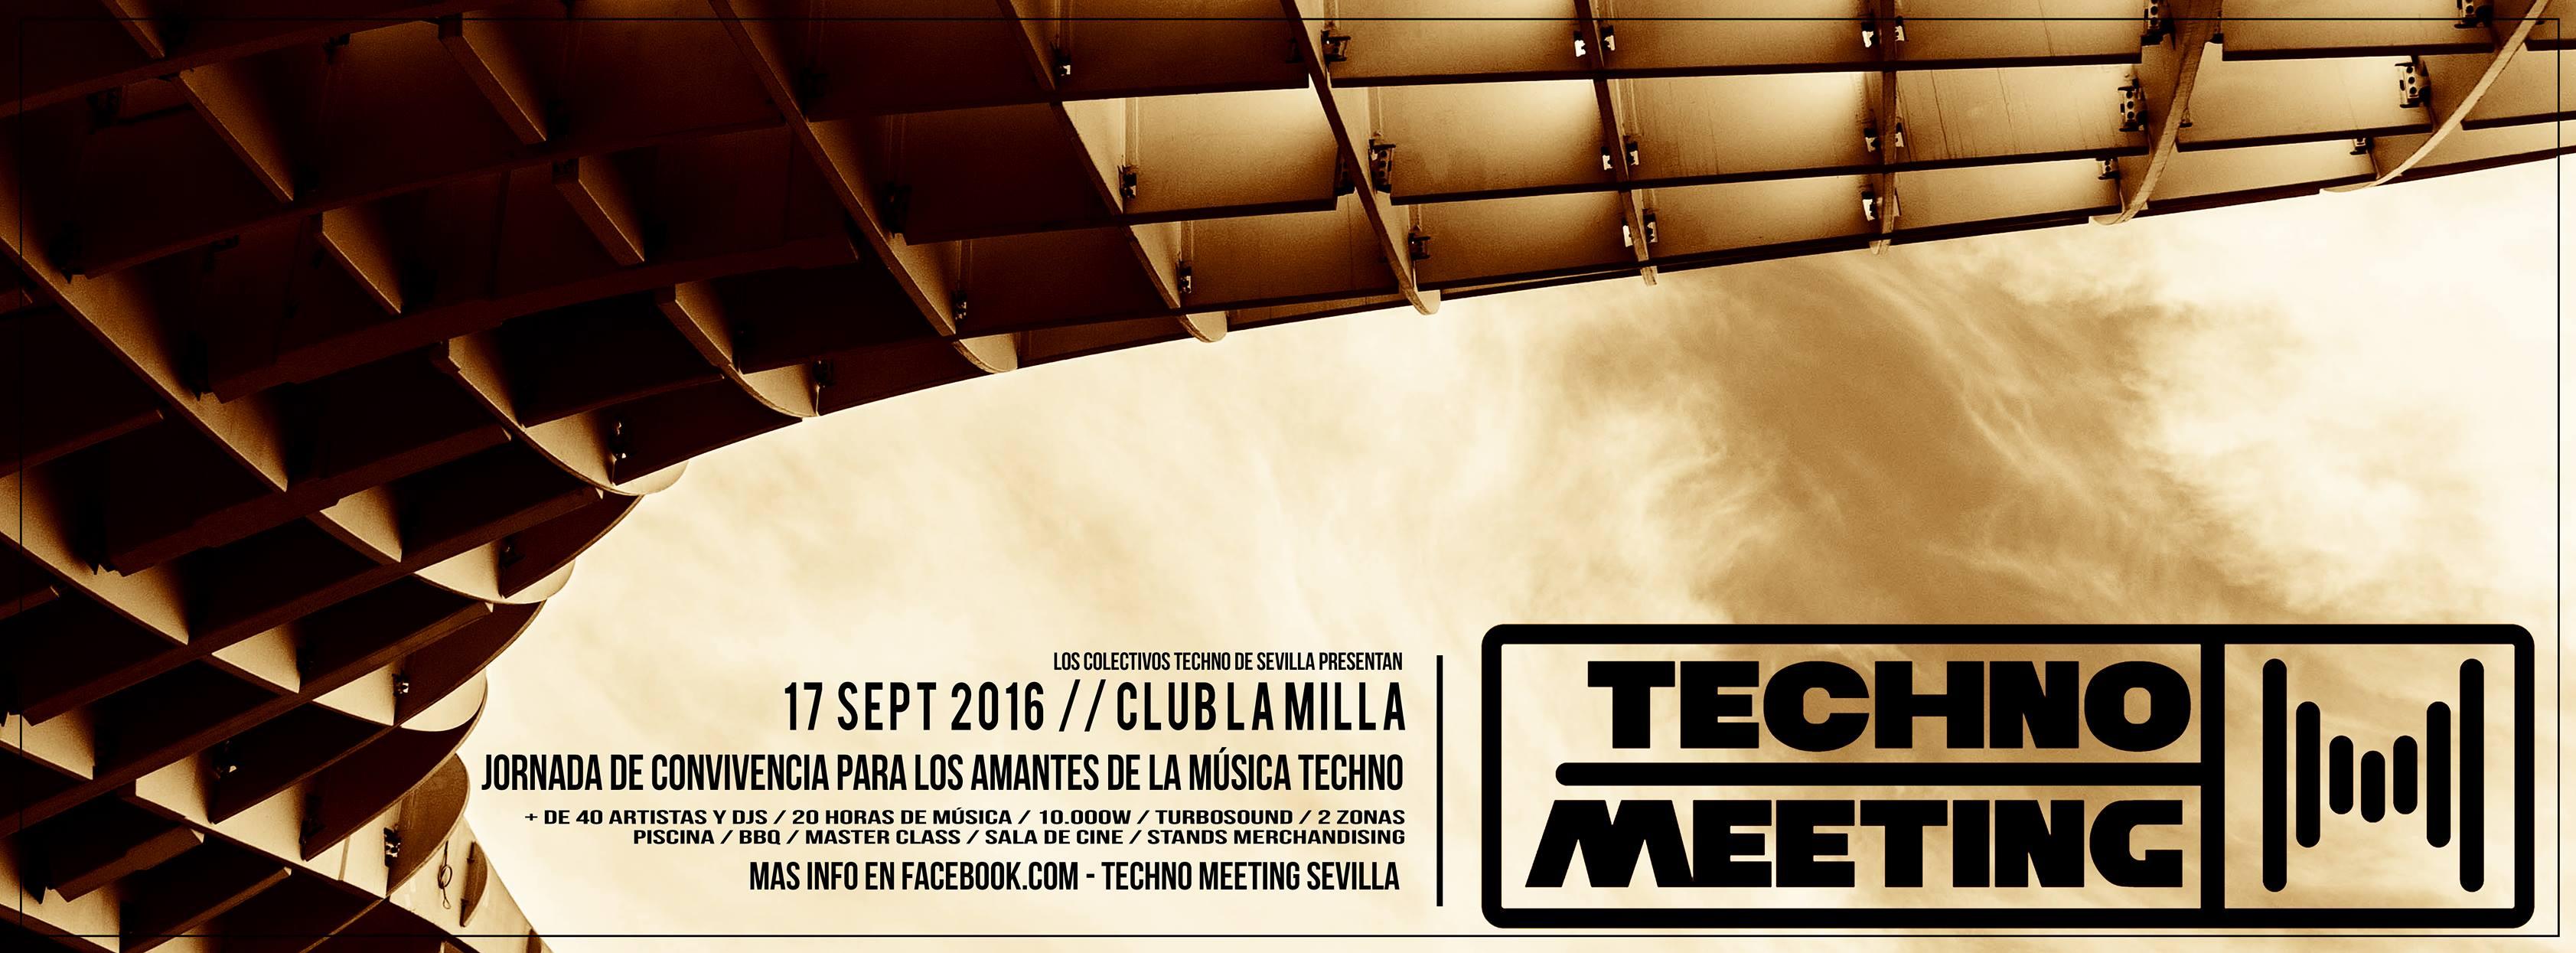 Techno Meeting Sevilla 2016 : Un lugar donde quedarse